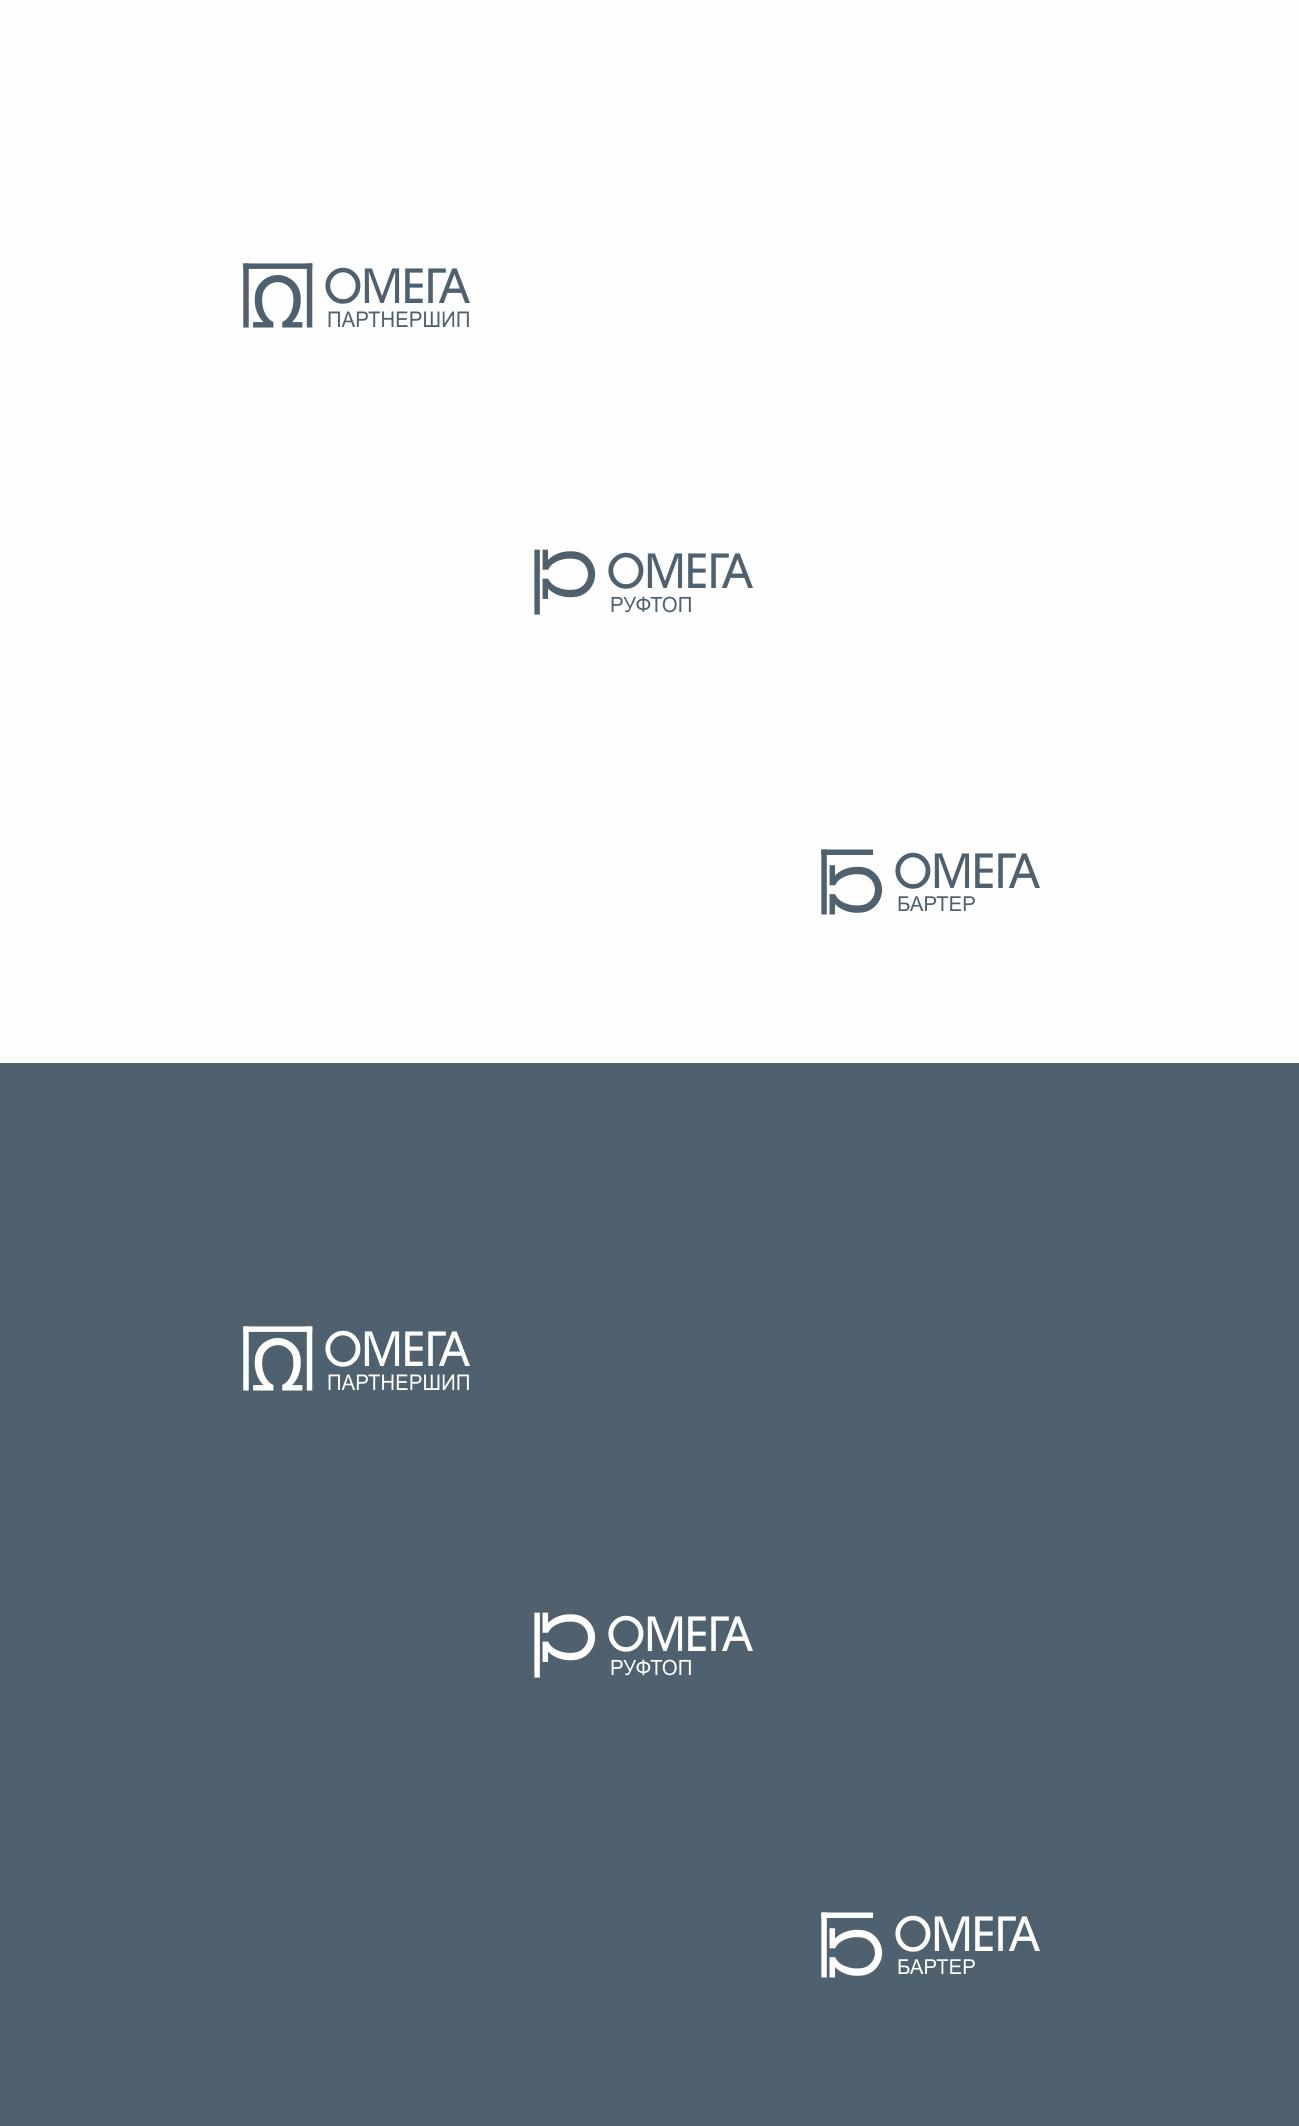 Придумать концепцию логотипа группы компаний фото f_7345b6c2174daad3.jpg